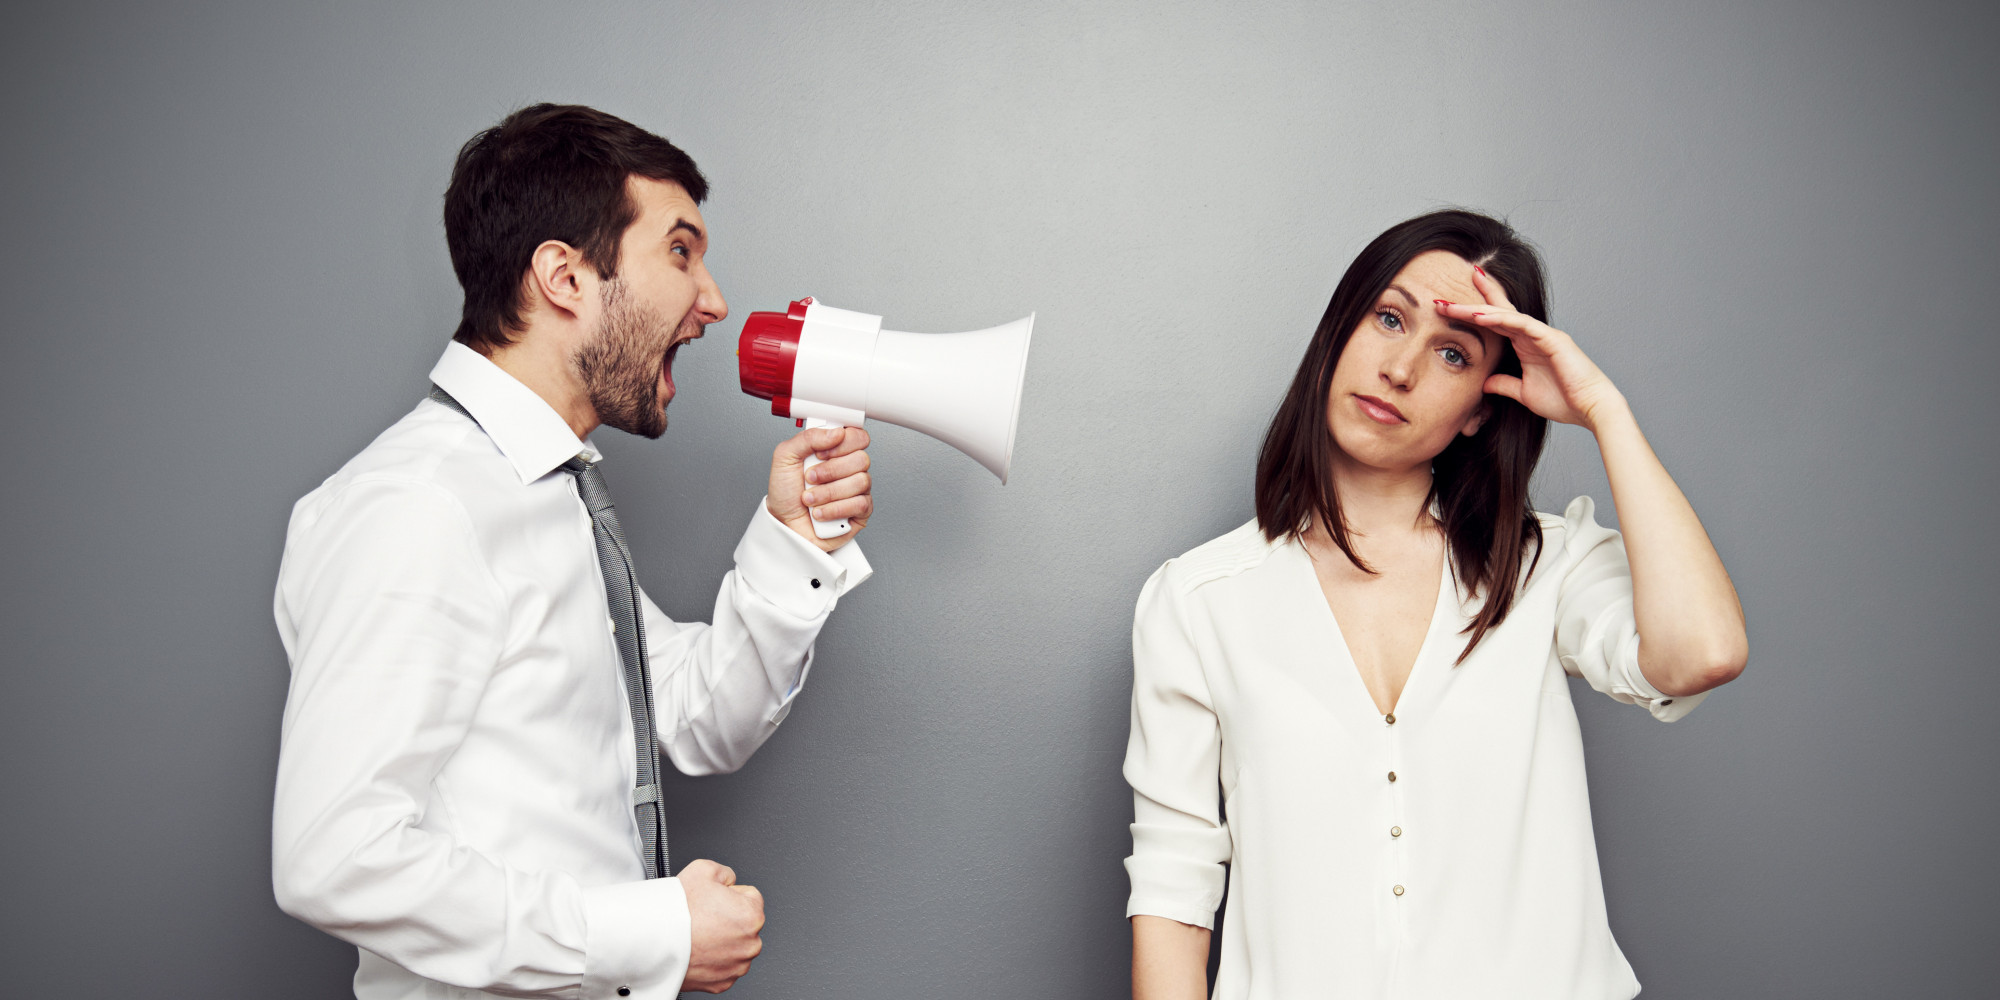 men vs women talk